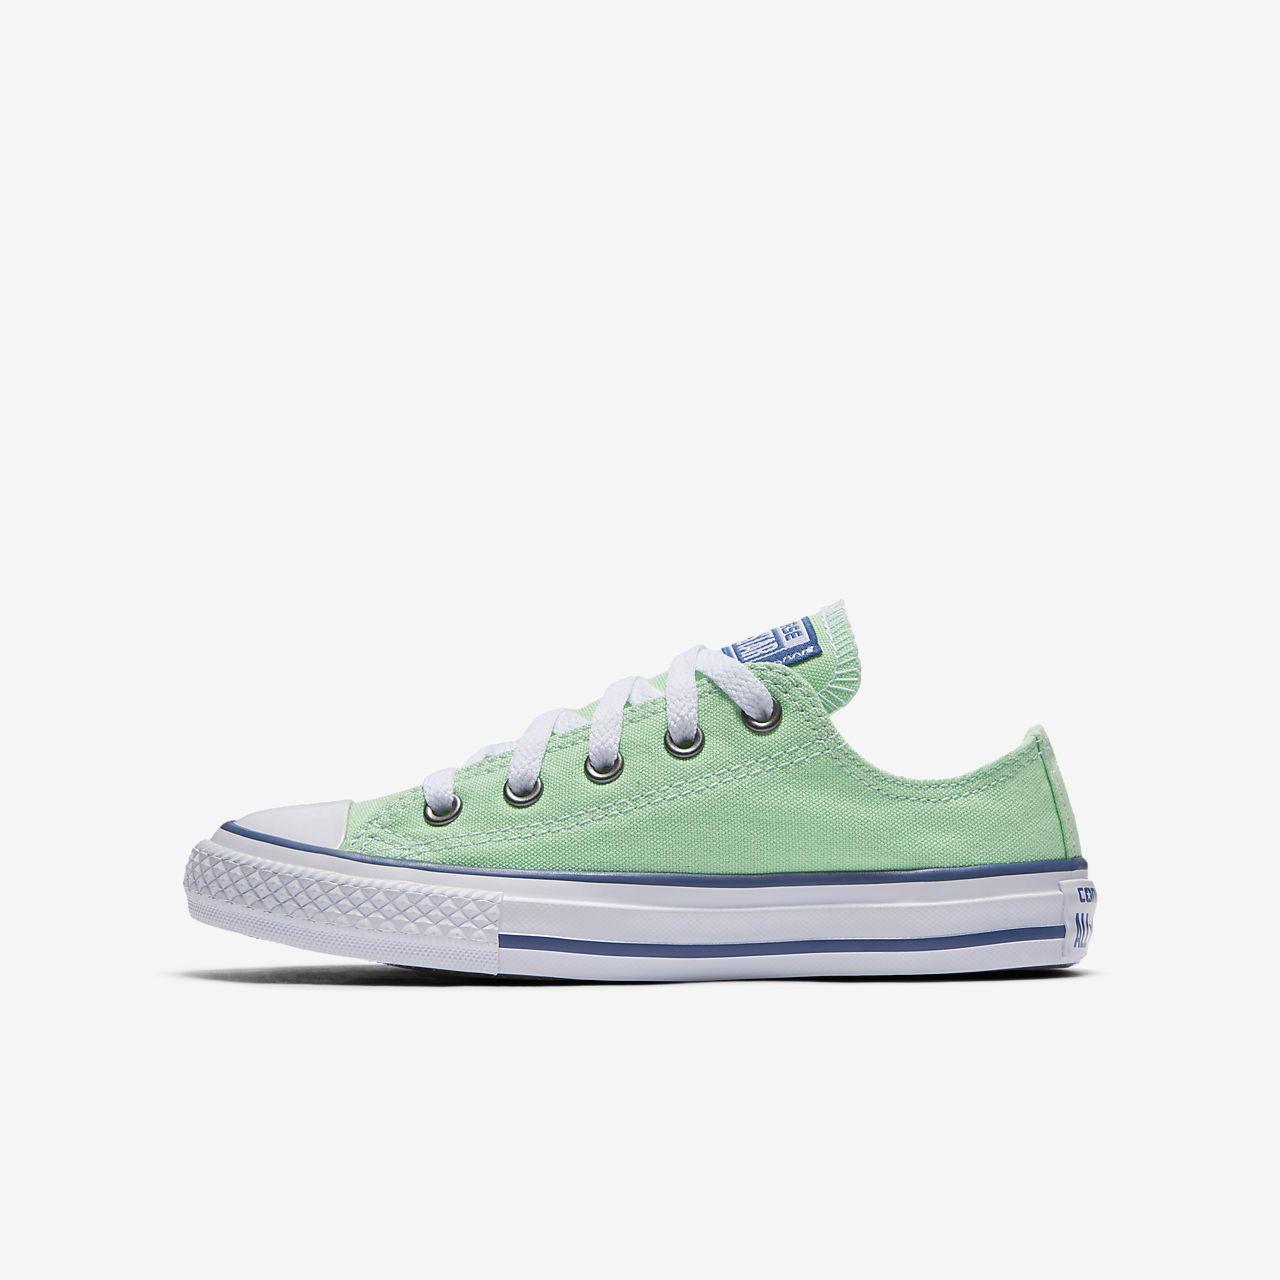 Converse Chuck Taylor All Star Seasonal Low Top Little/Big Kids' Unisex Shoe